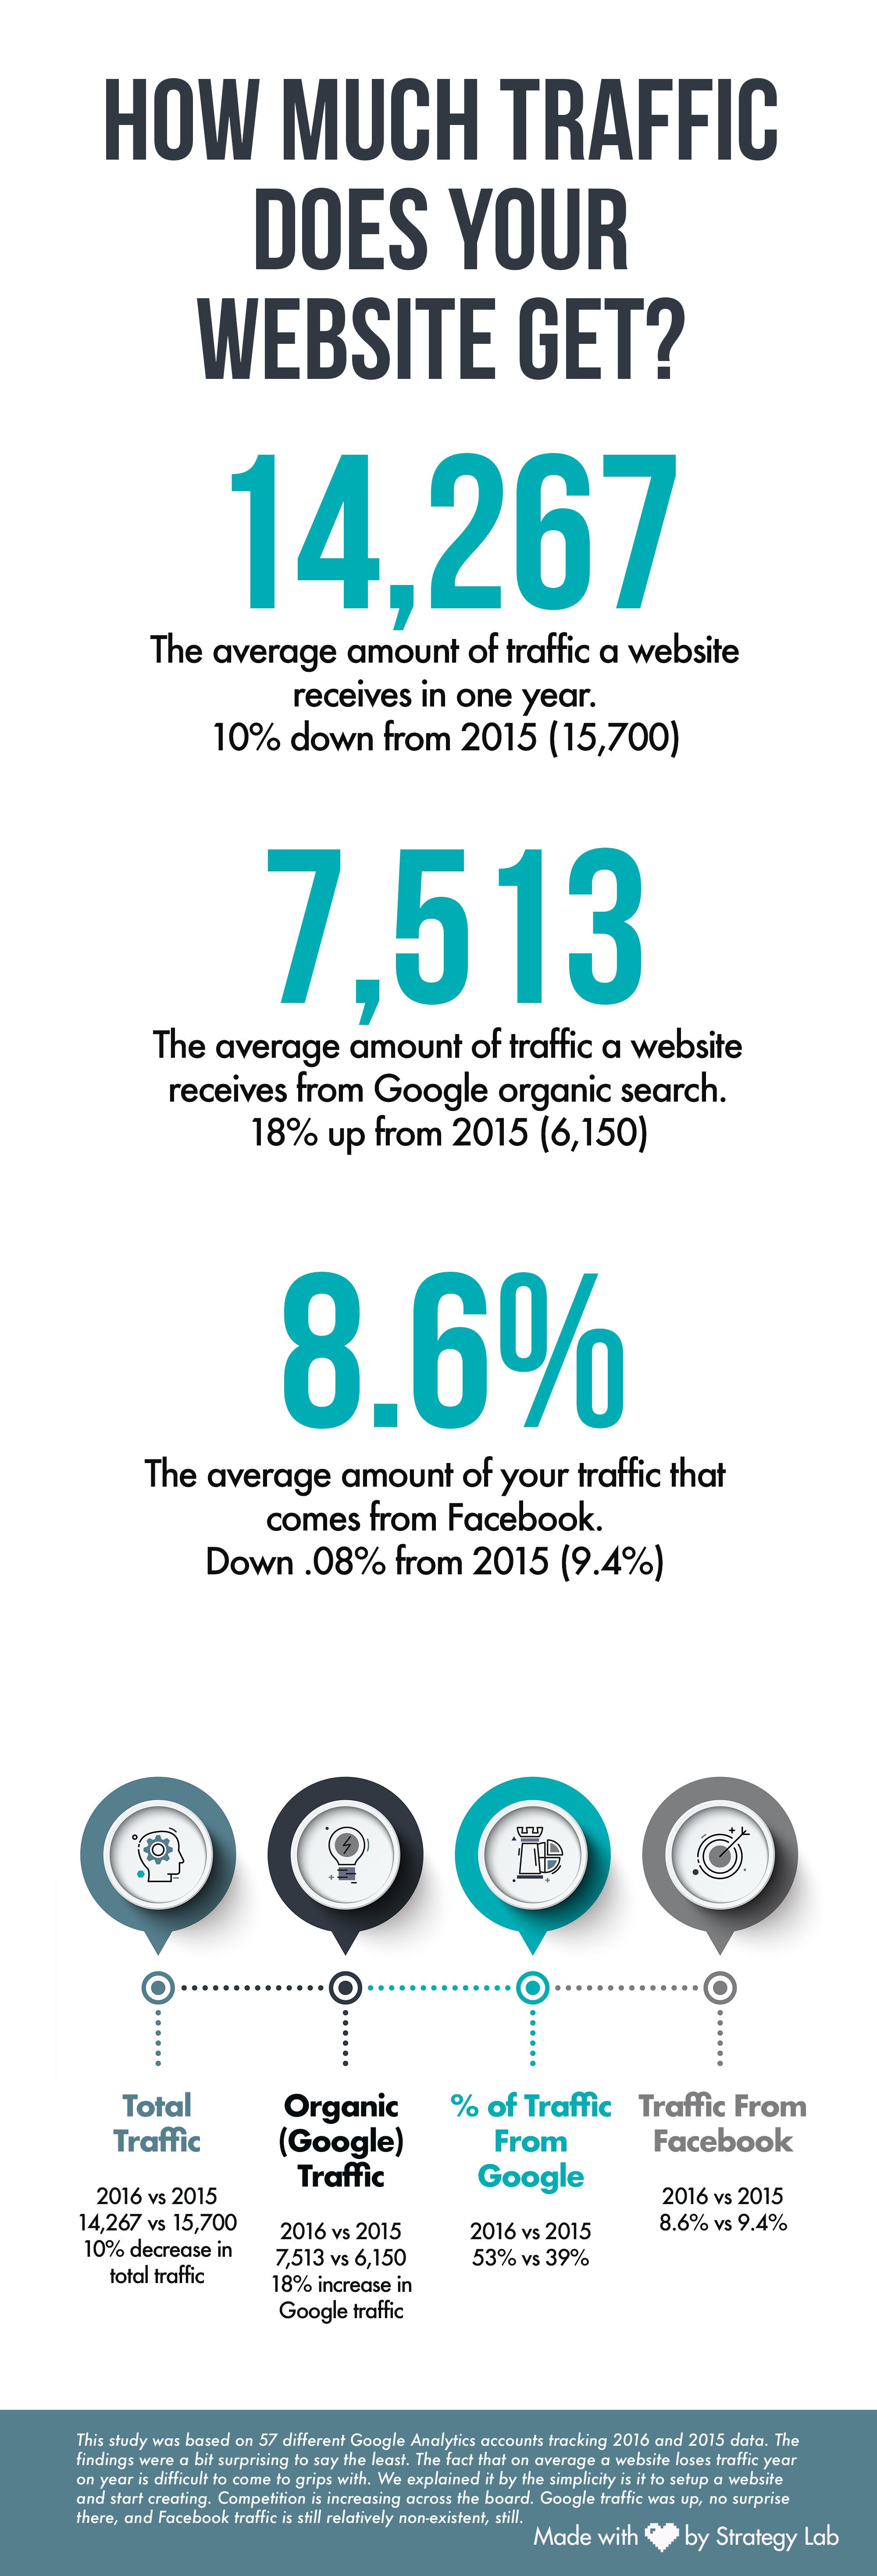 Infographic for Google analytics study